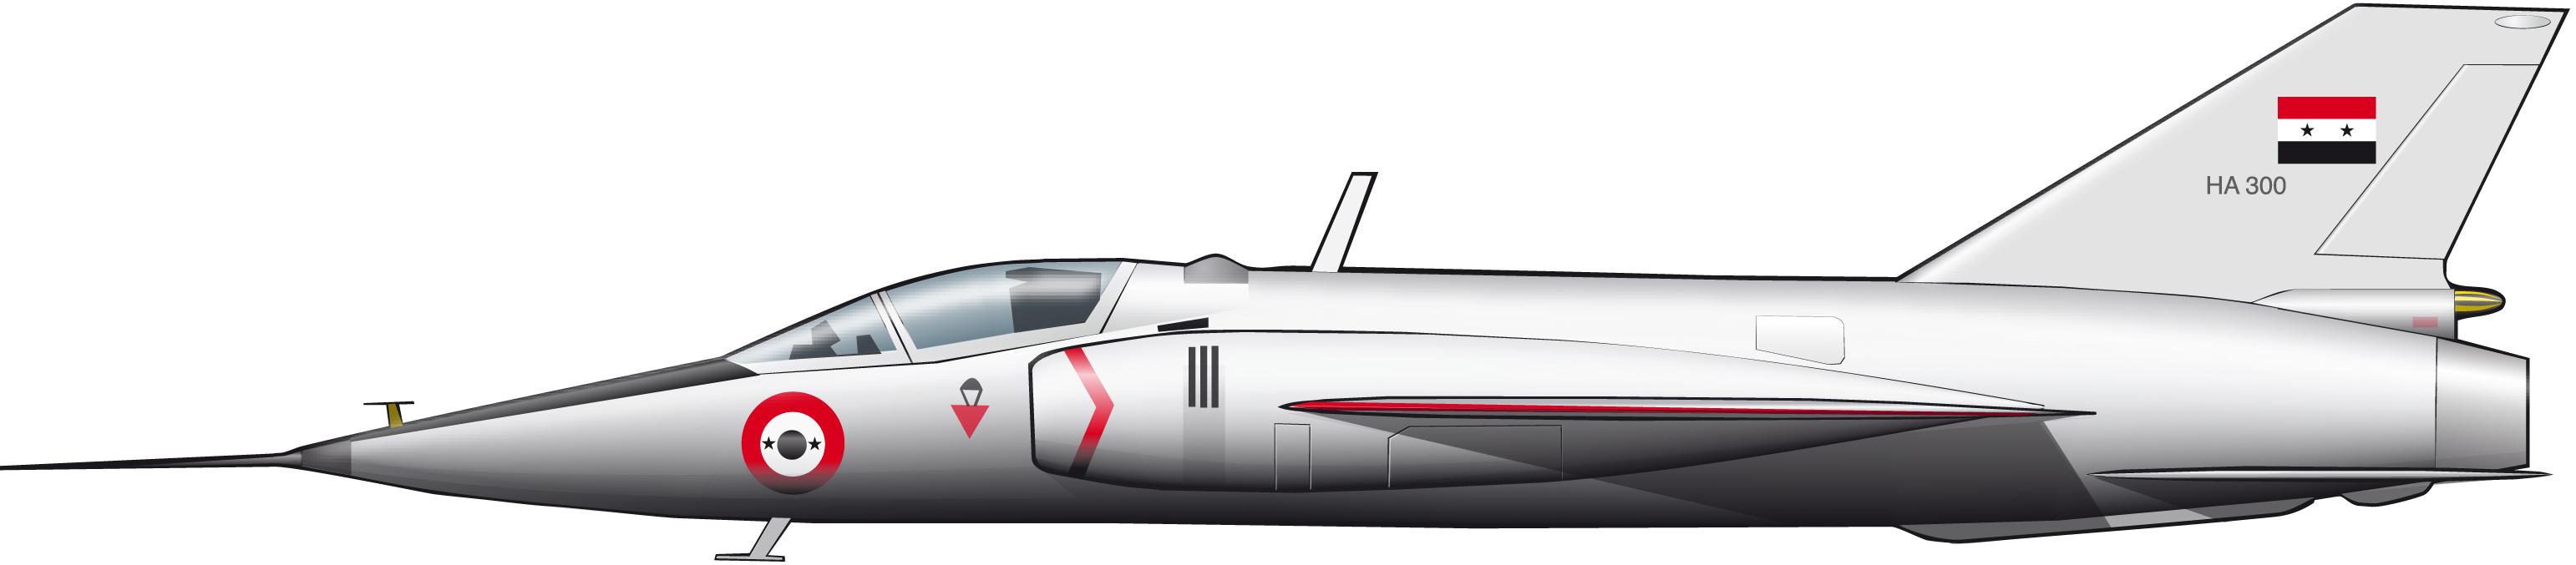 HA-300: el proyecto hispanoegipcioindio